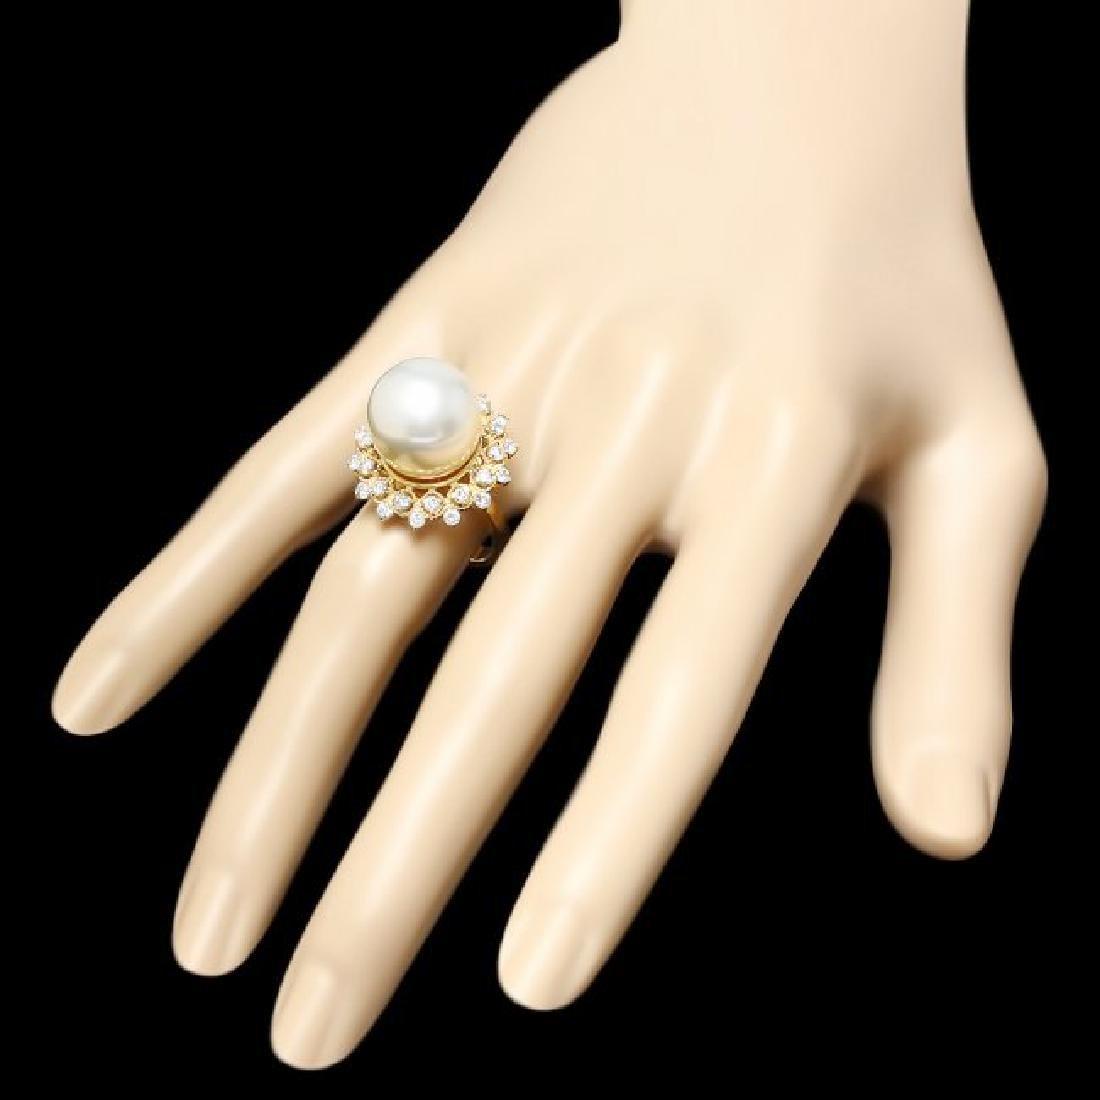 14k Gold 14 X 14mm Pearl 1.00ct Diamond Ring - 3